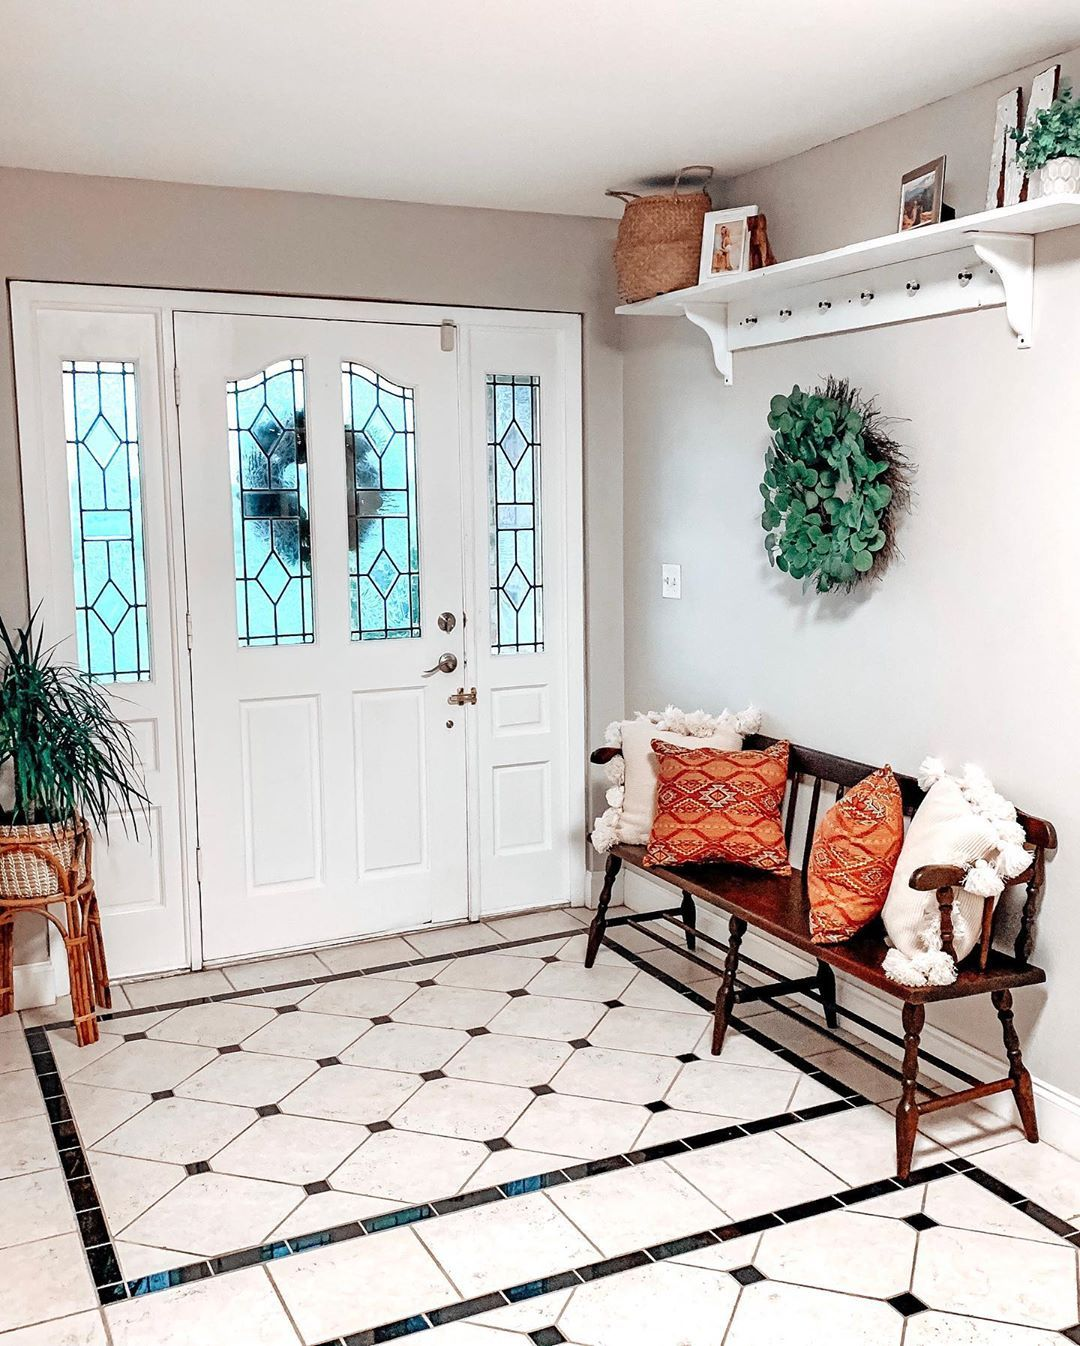 I love having an actual entryway ♥️ #houseplants #sherwinwilliams #agreeablegray #diy #refinishedfurniture #newhome